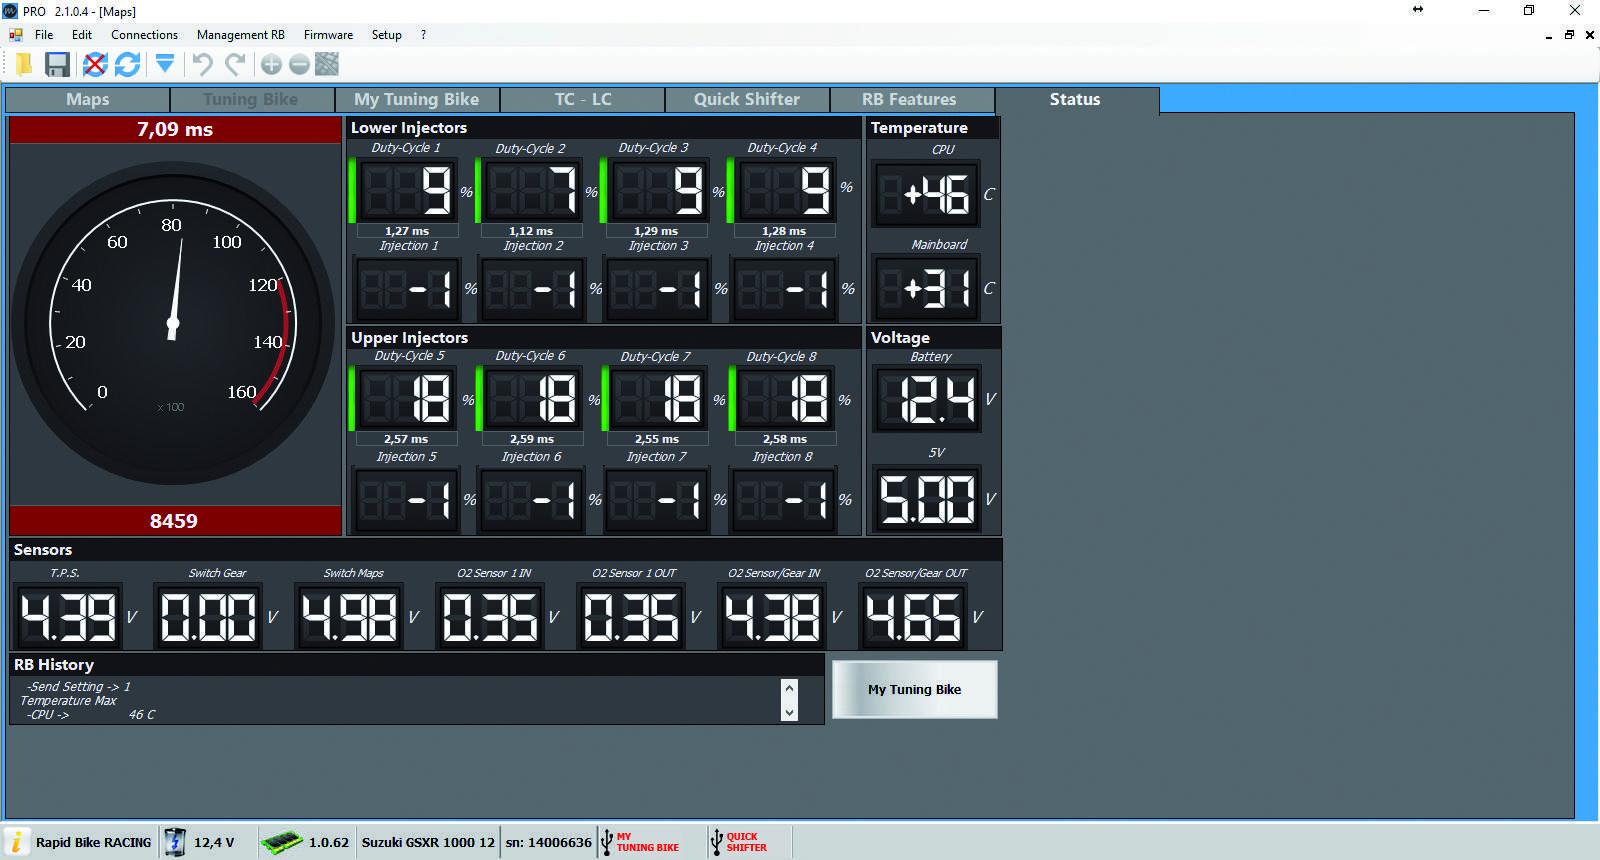 thumb999_rapidbike_software_2_1556995318